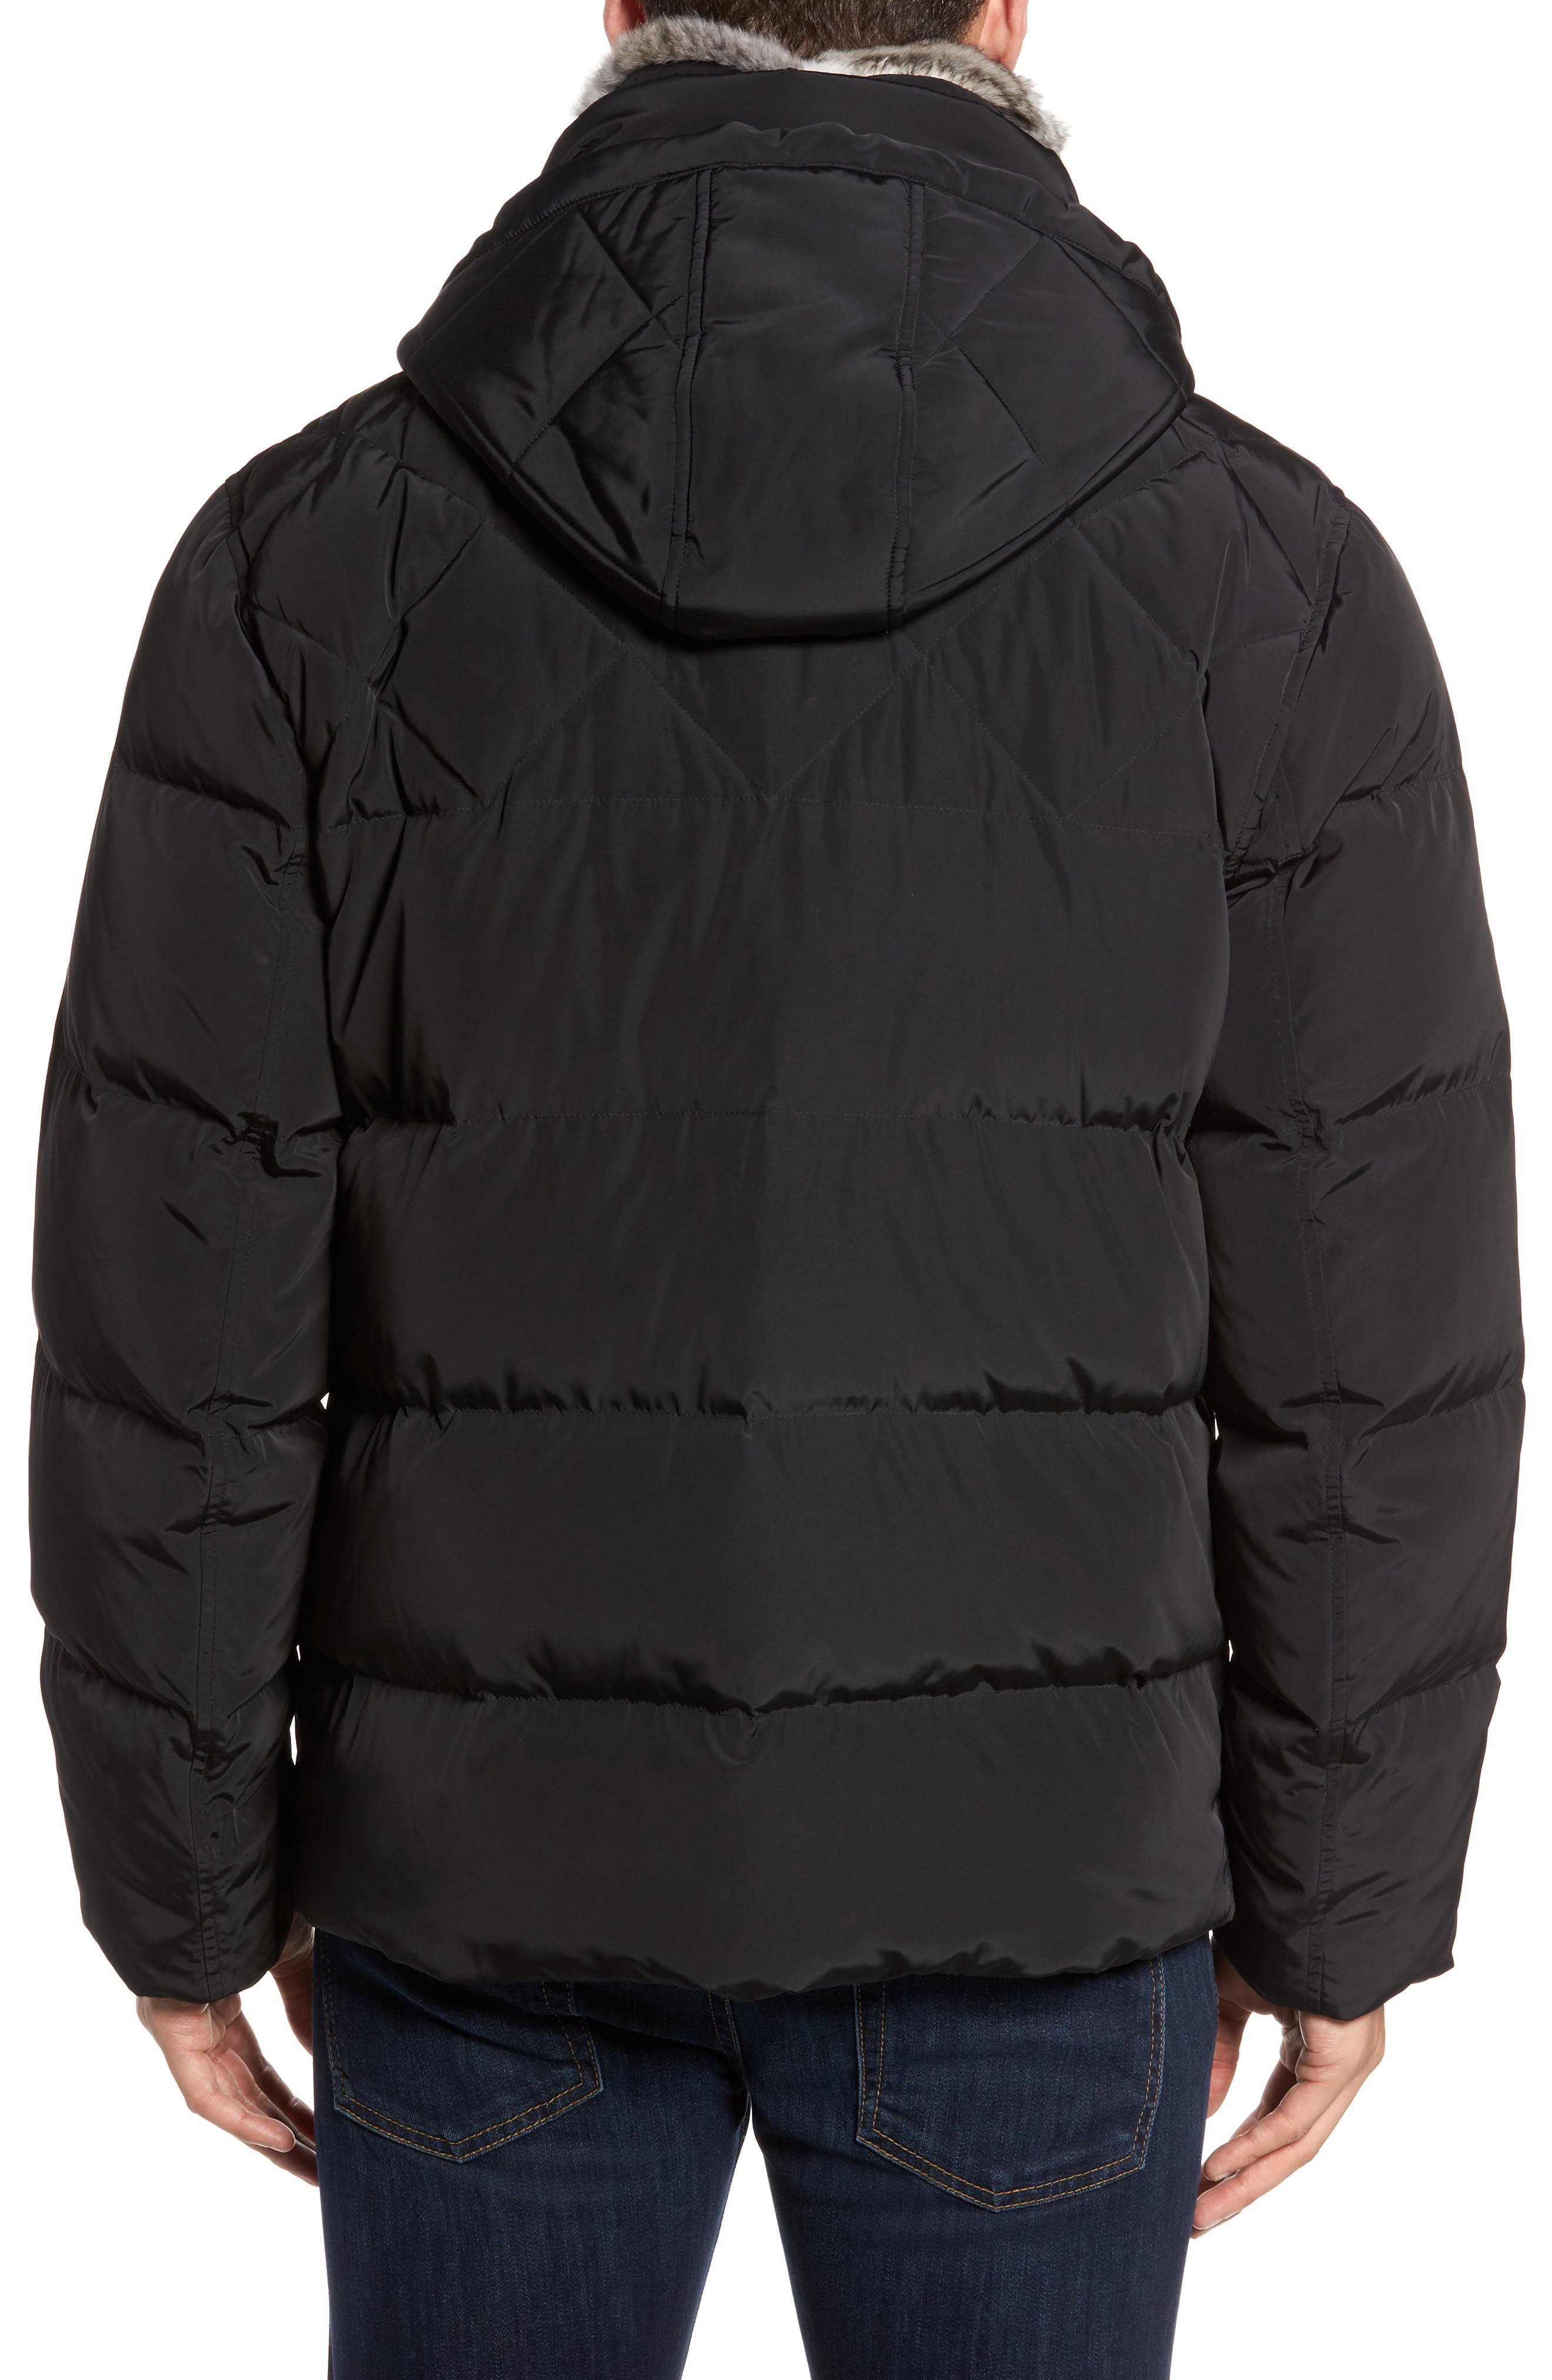 Navan Quilted Down Jacket with Genuine Rabbit Fur Trim,                             Alternate thumbnail 2, color,                             Black